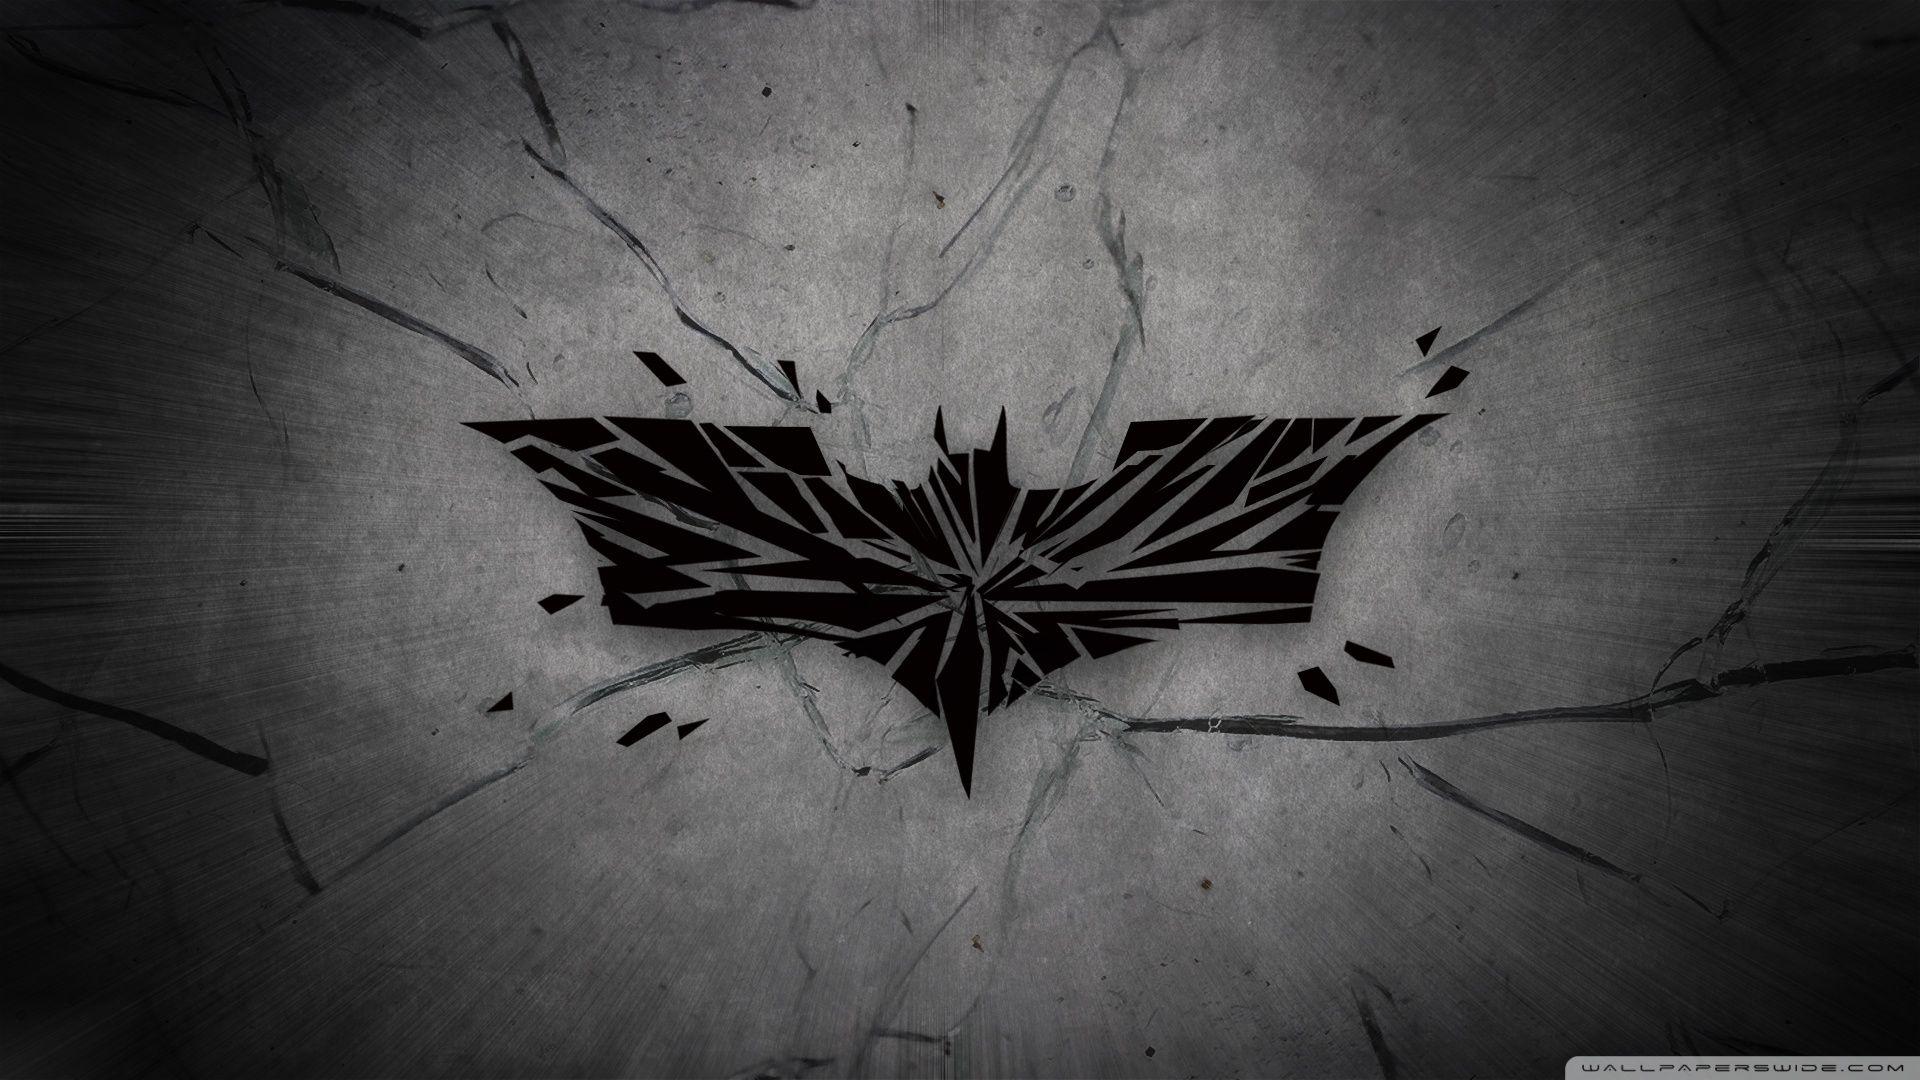 Cool batman logo wallpaper hd 1080p tinzie guhpix gallery cool batman logo wallpaper hd 1080p tinzie voltagebd Image collections